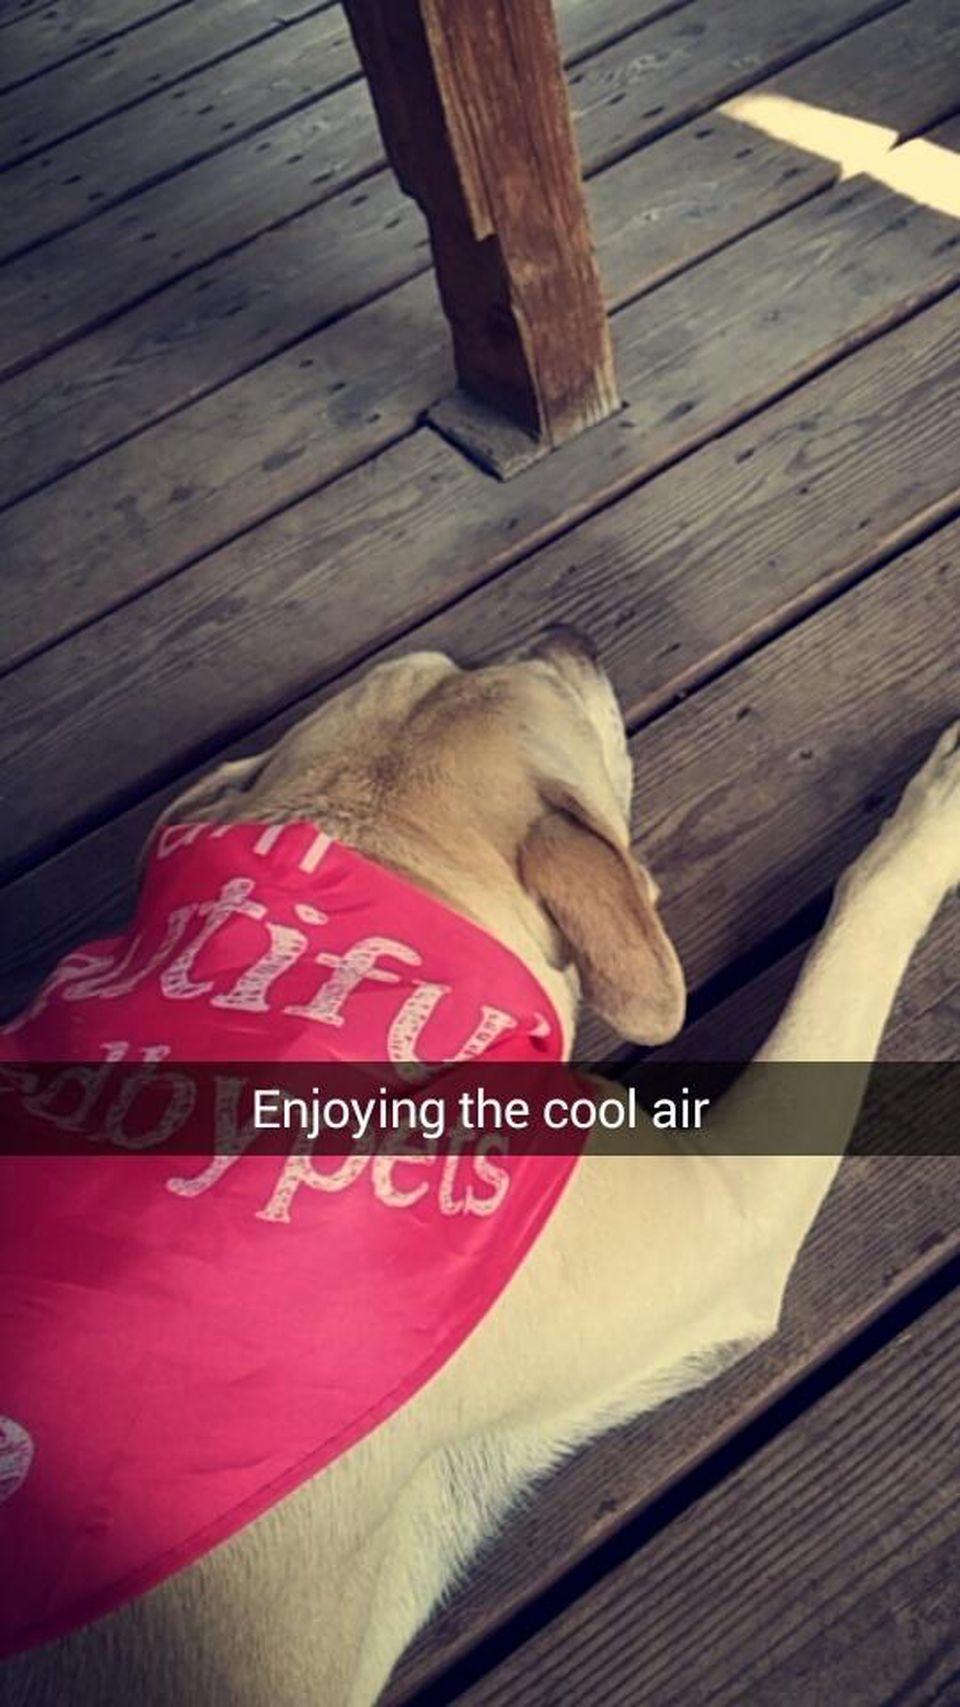 Enjoying the cool air